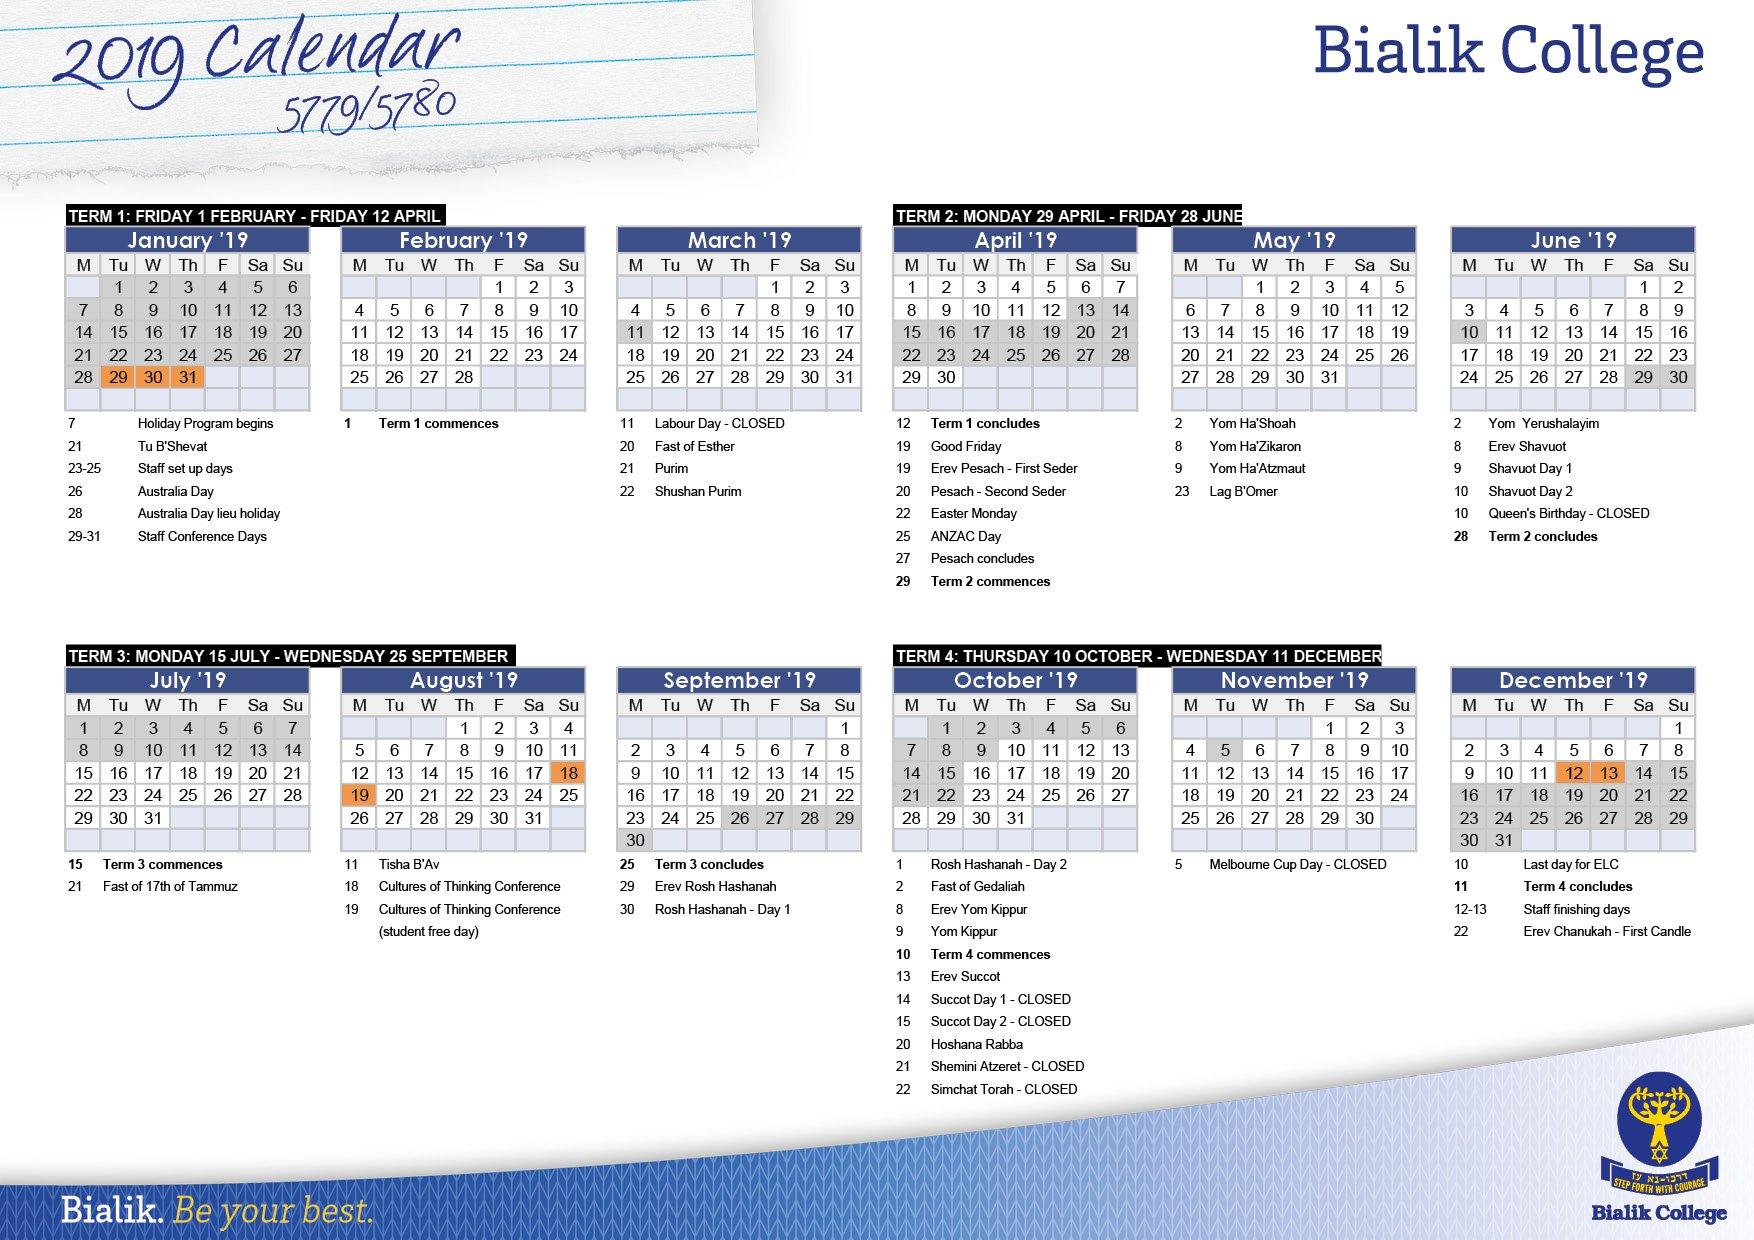 Calendar - Bialik Calendar 2019 Victoria School Holidays